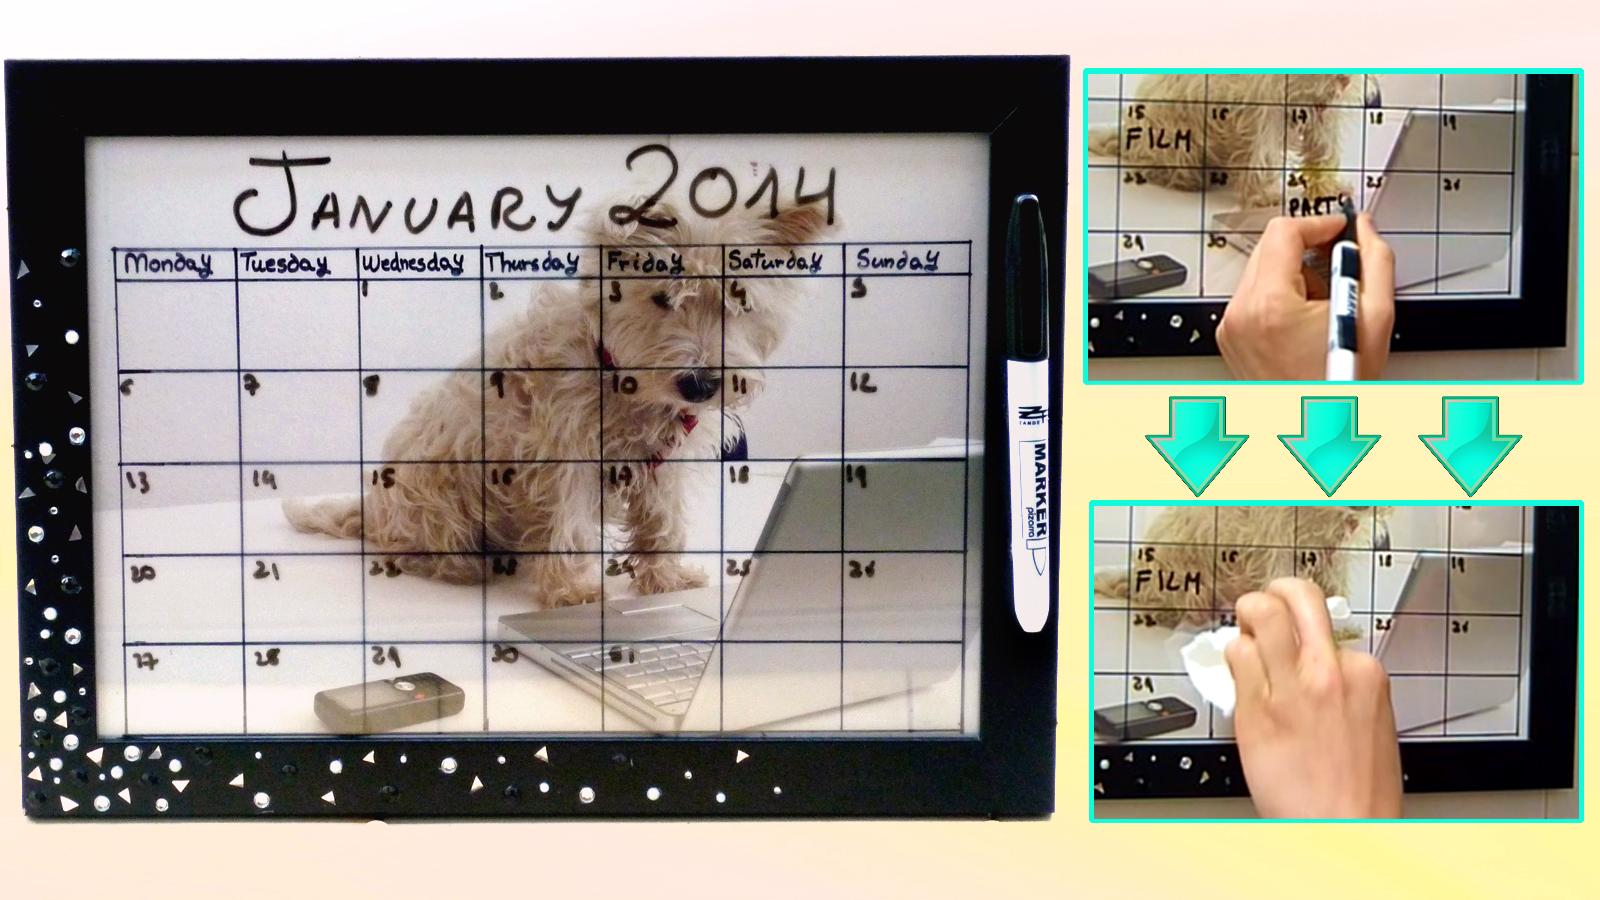 DIY dry erase calendar for the new year! Easy & customizable